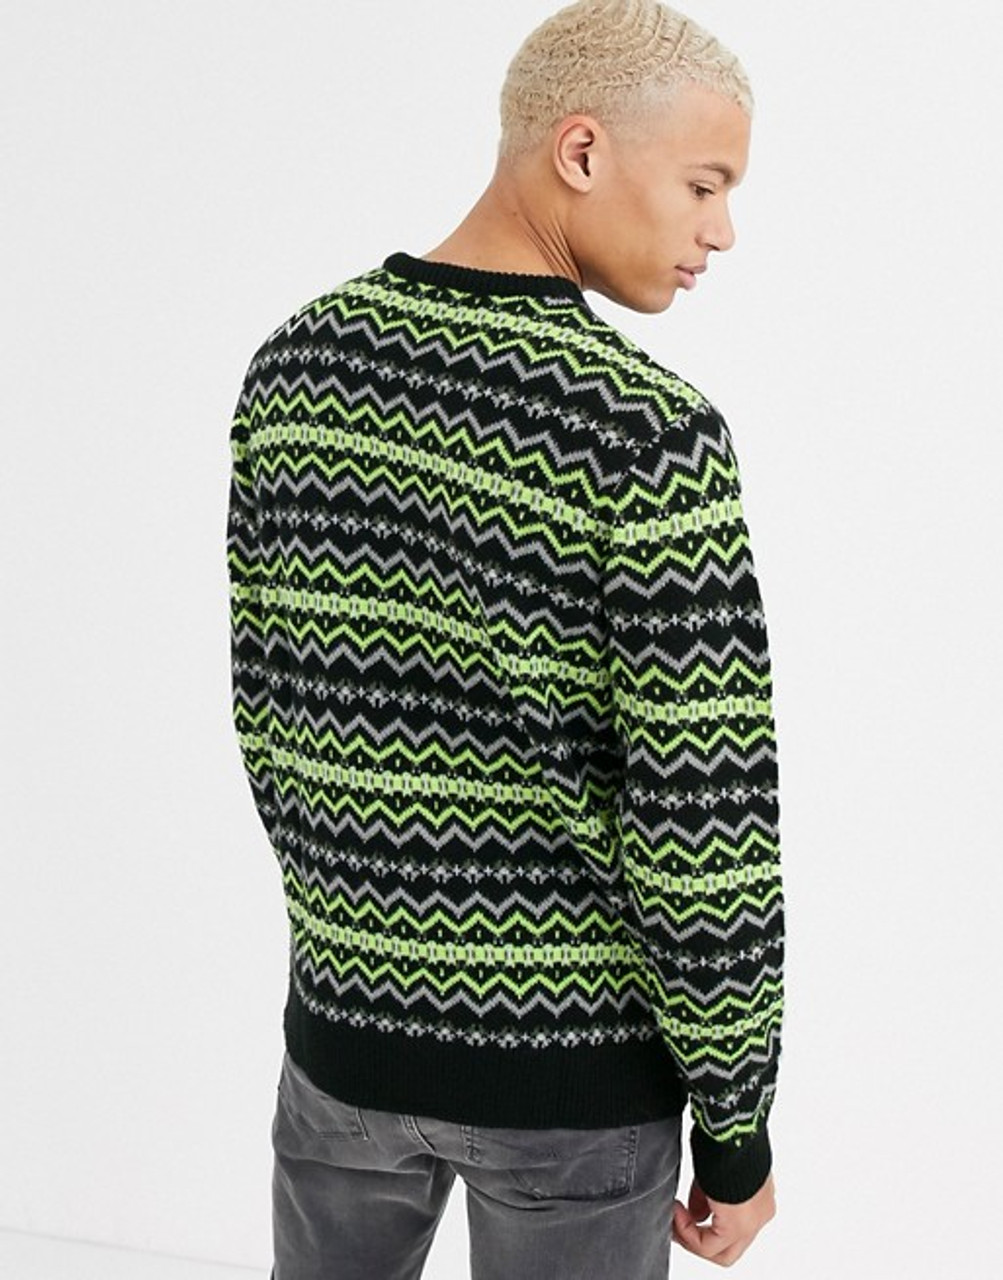 Black Neon Green Fairisle Knitted Jumper